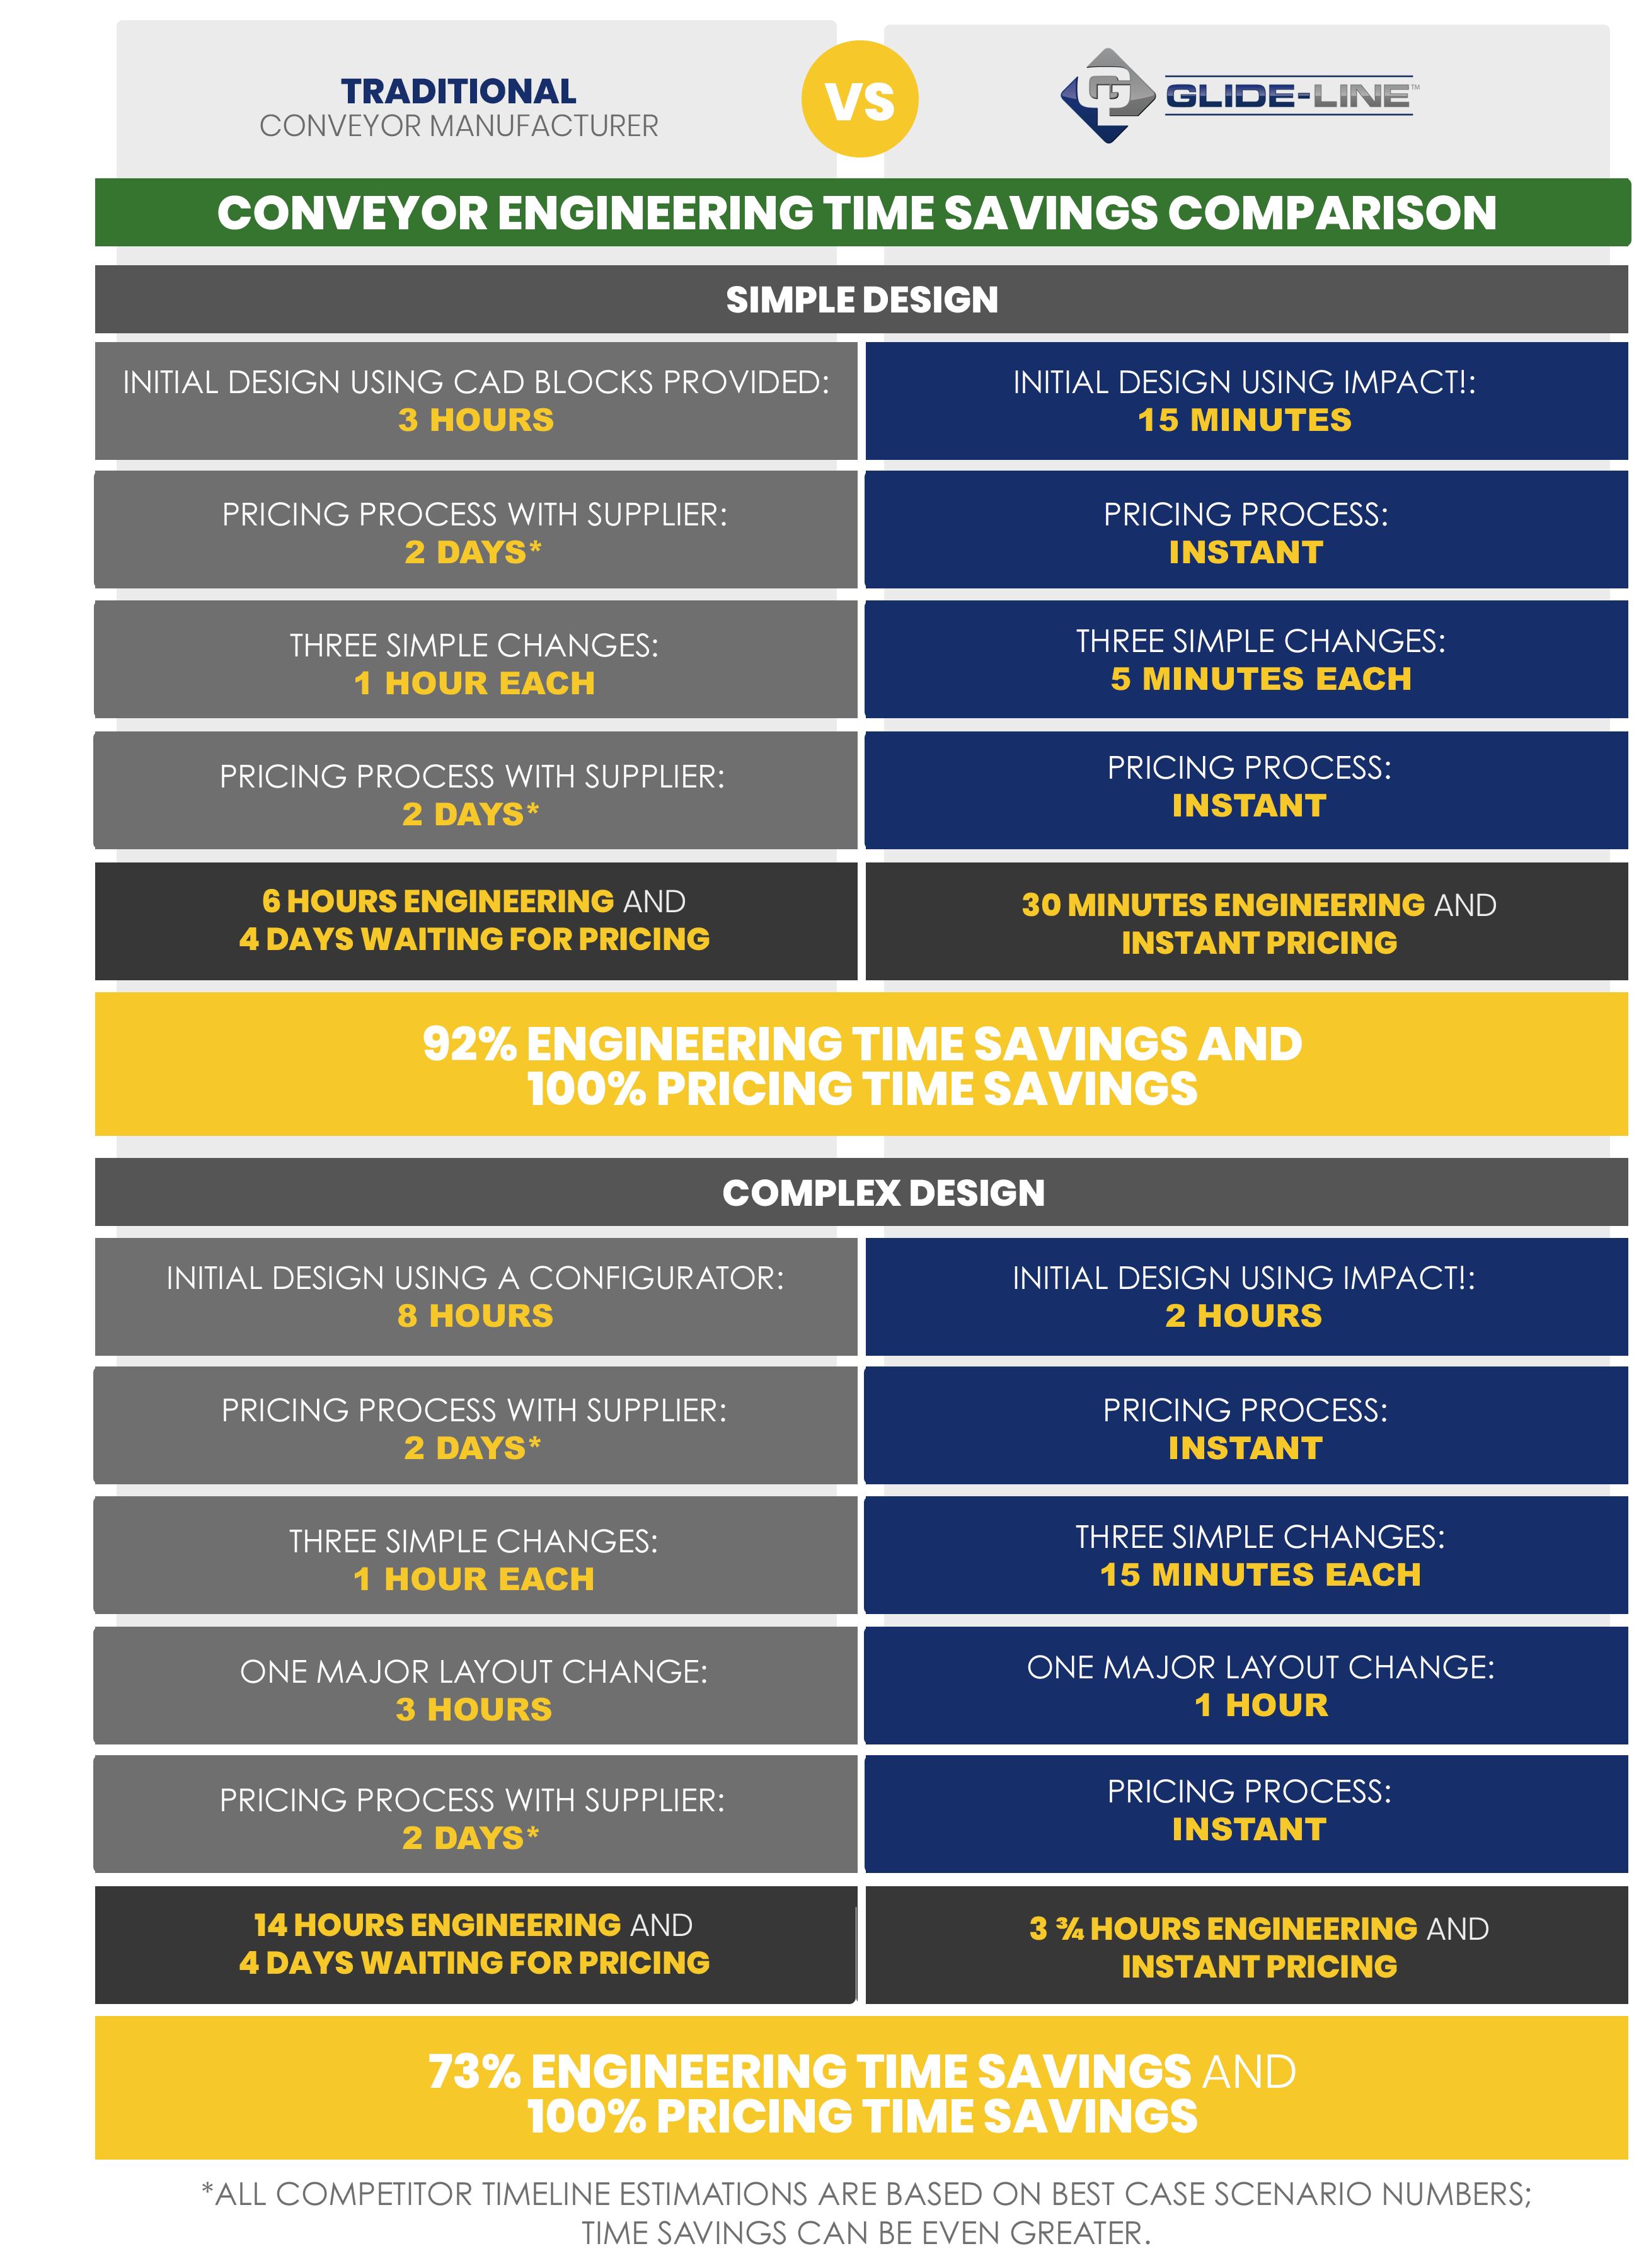 Conveyor Time Savings Comparison - Engineering (4)